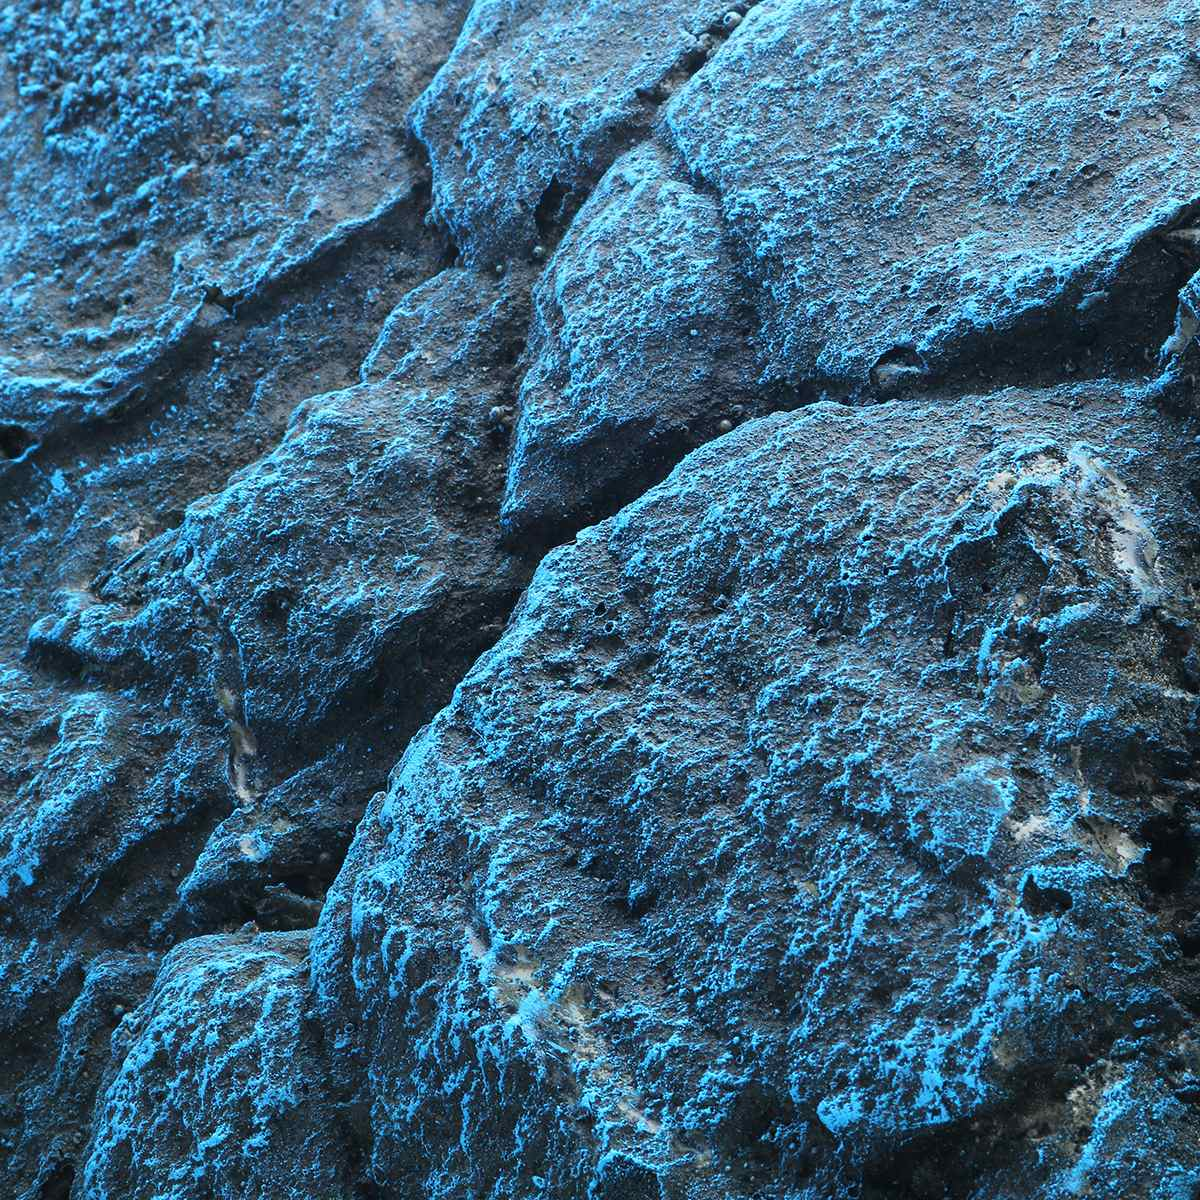 US $51 9 |3D Foam Rock Reptile Stone Aquarium Background Backdrop Fish Tank  Board Decor Underwater Aquarium Landscape Decoration 60x45cm-in